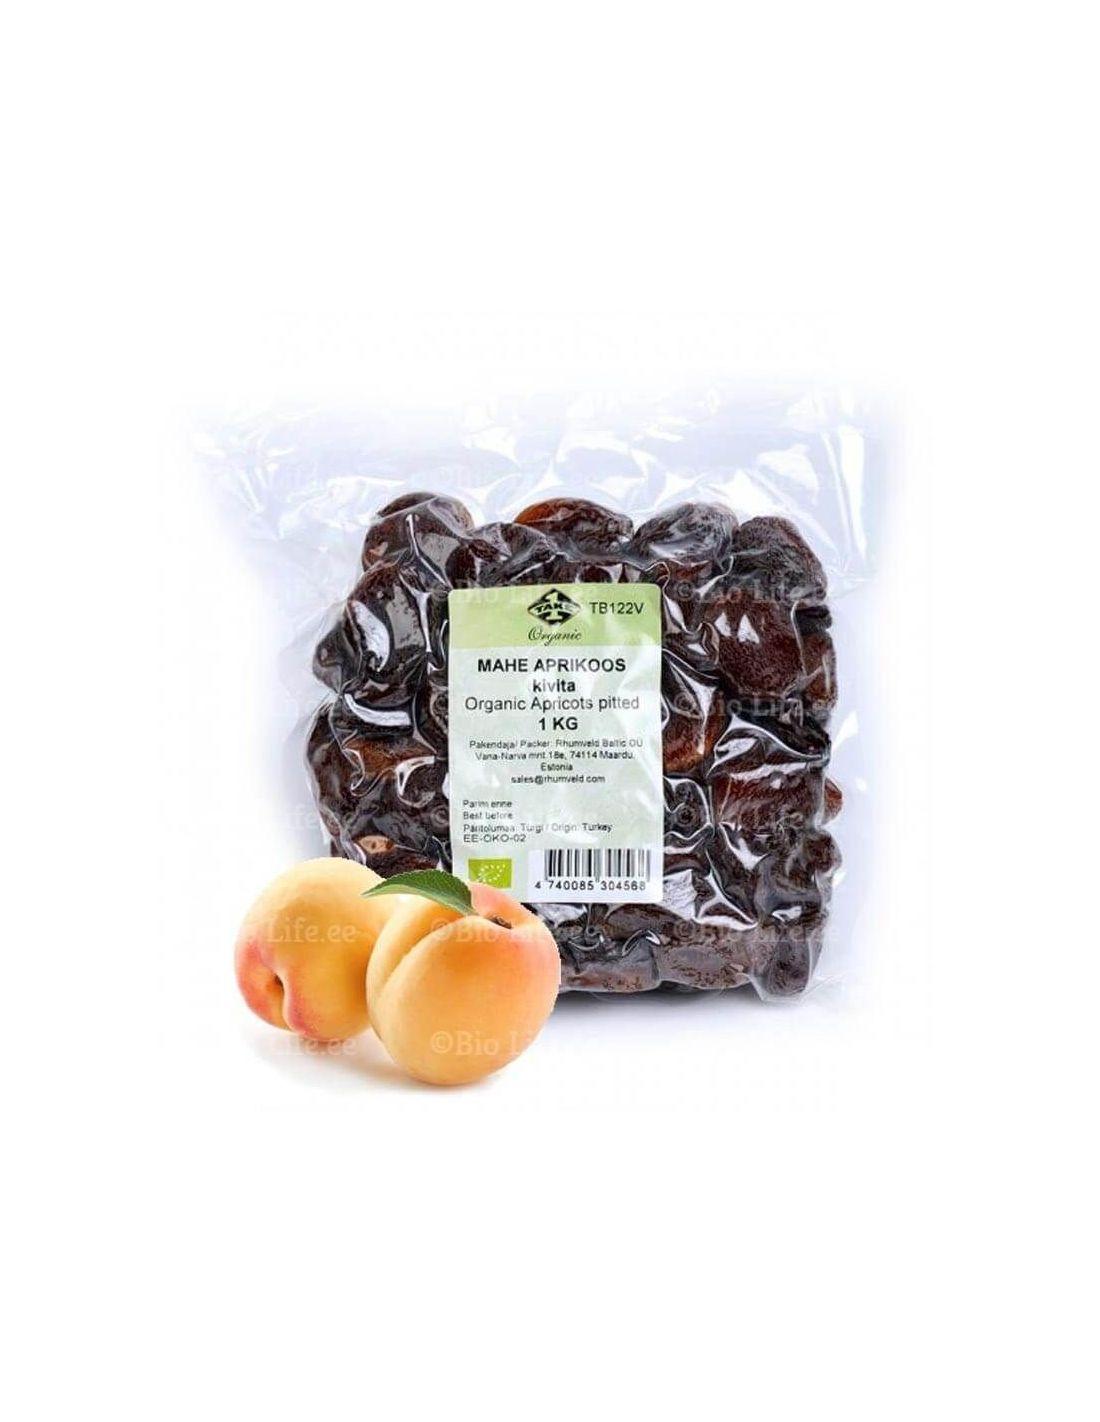 Mahe aprikoos, kivita 1kg